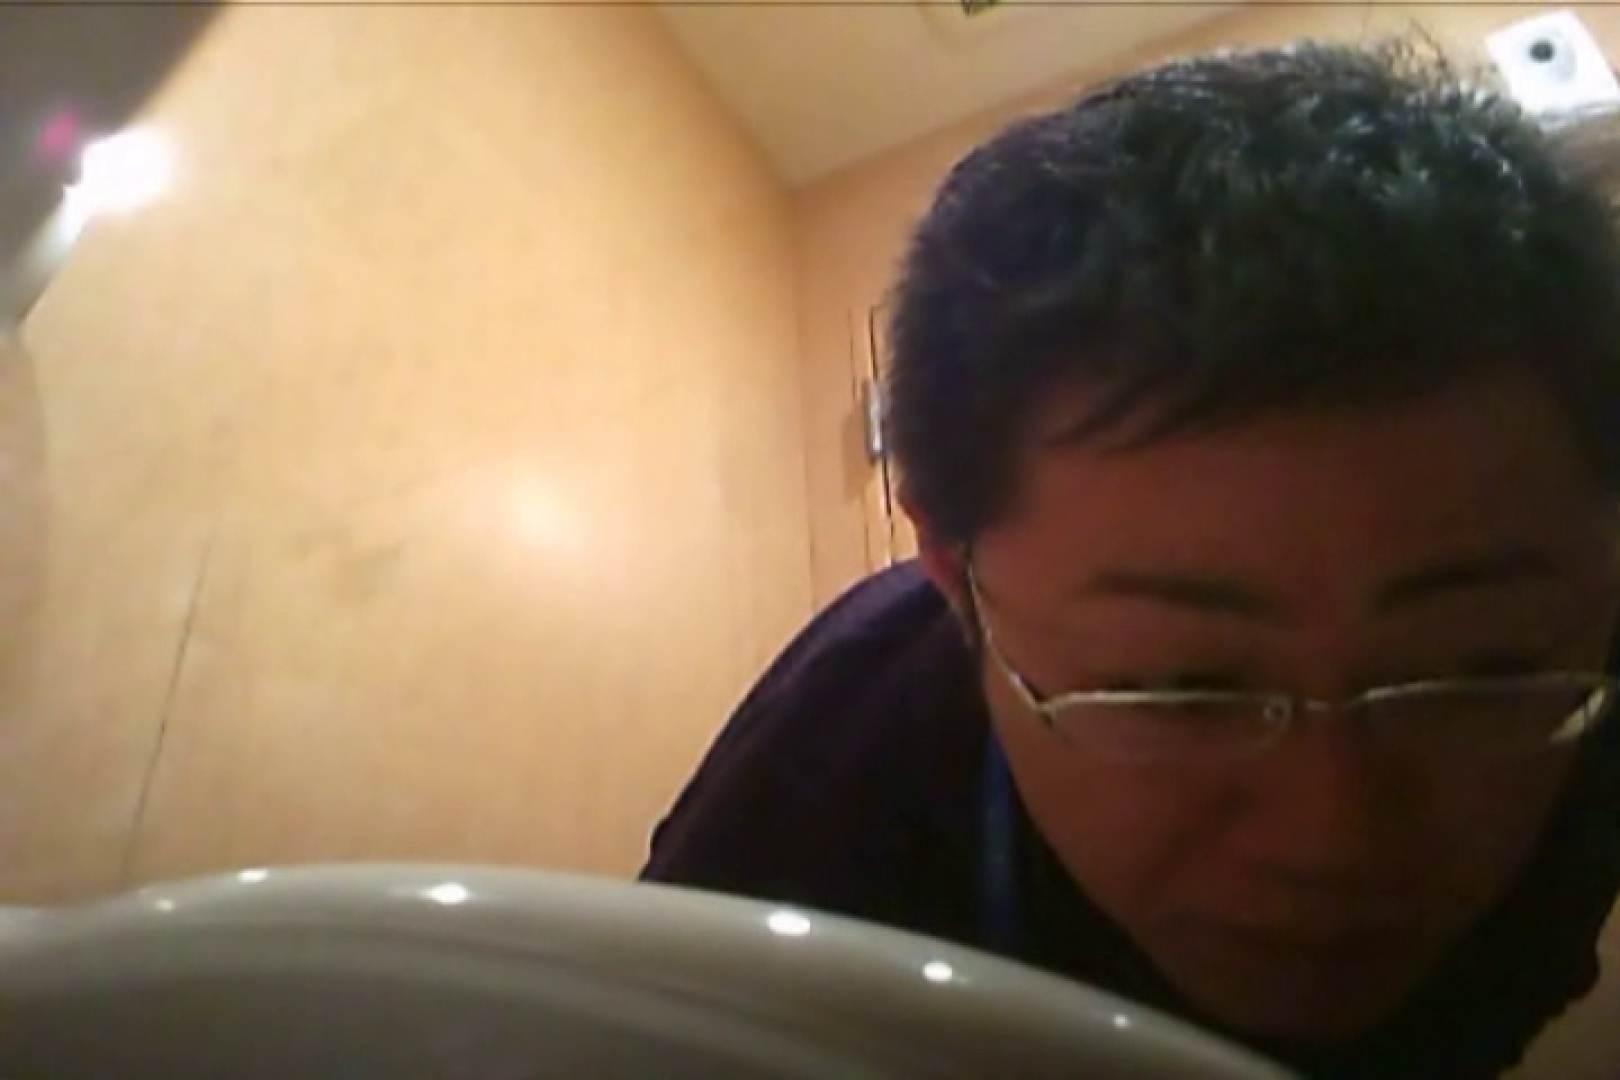 Gボーイ初投稿!掴み取りさんの洗面所覗き!in新幹線!VOL.18 覗きお宝  106連発 91